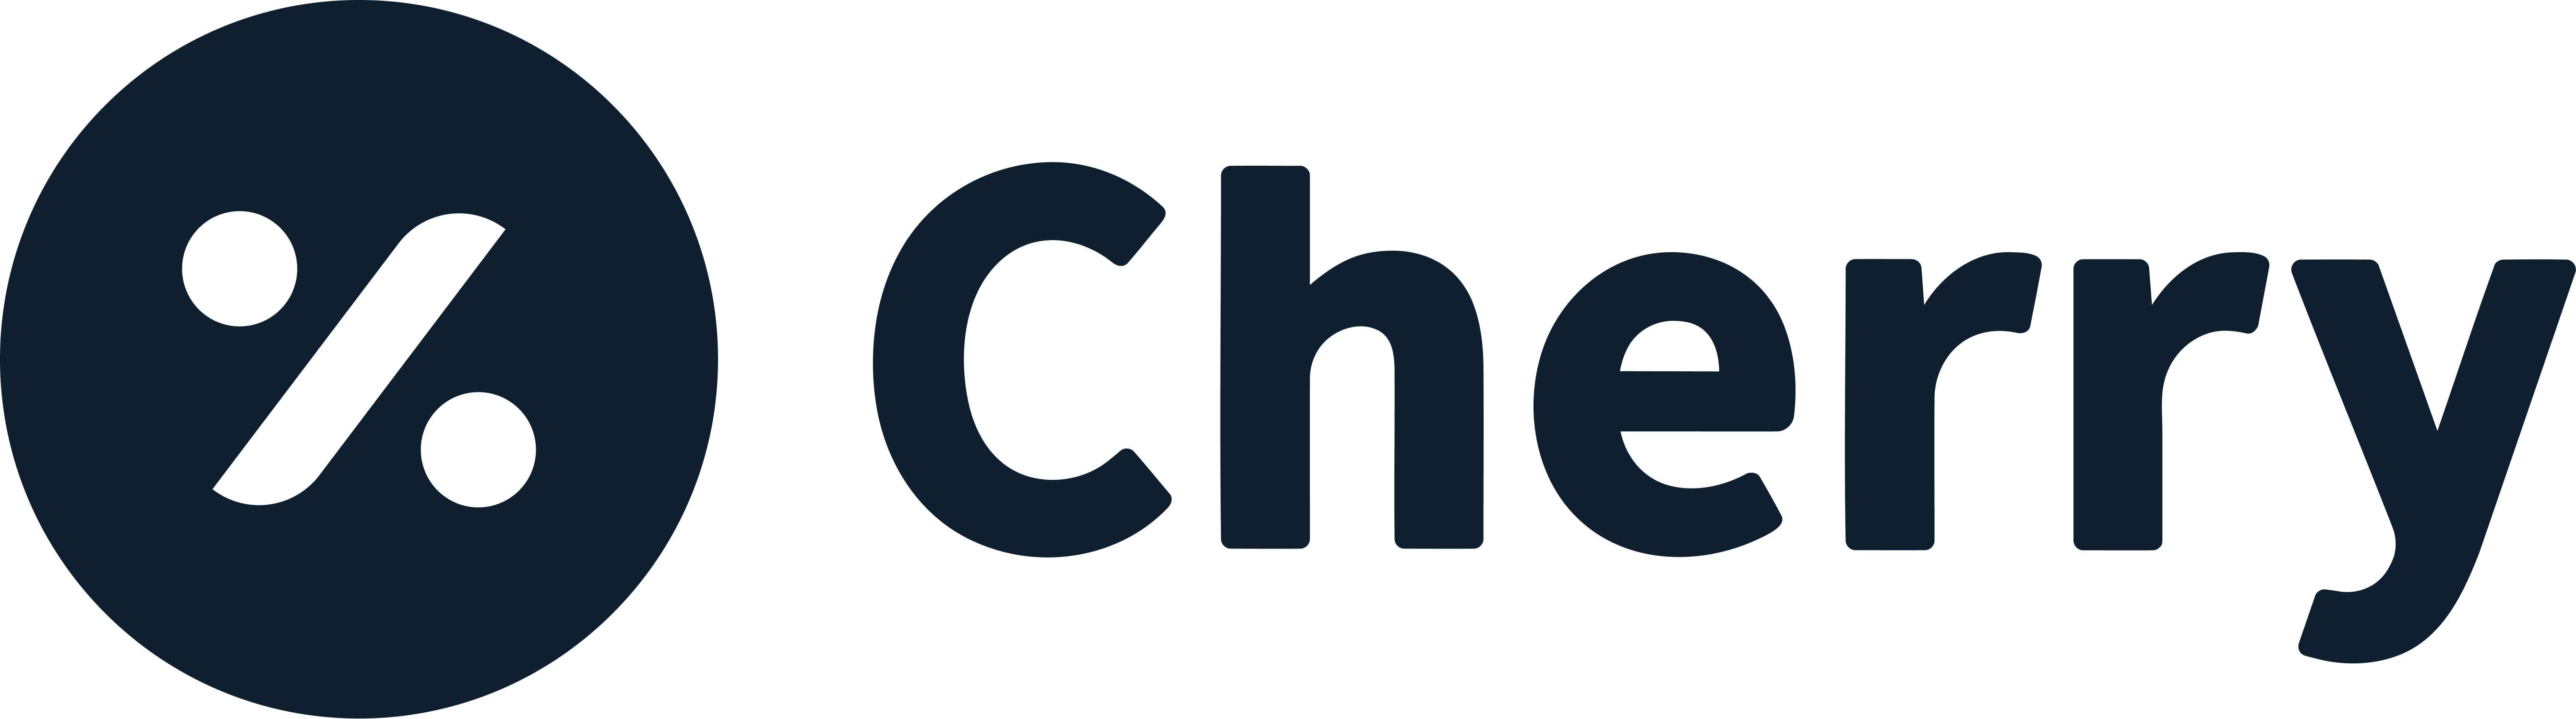 Cherry Technologies logo